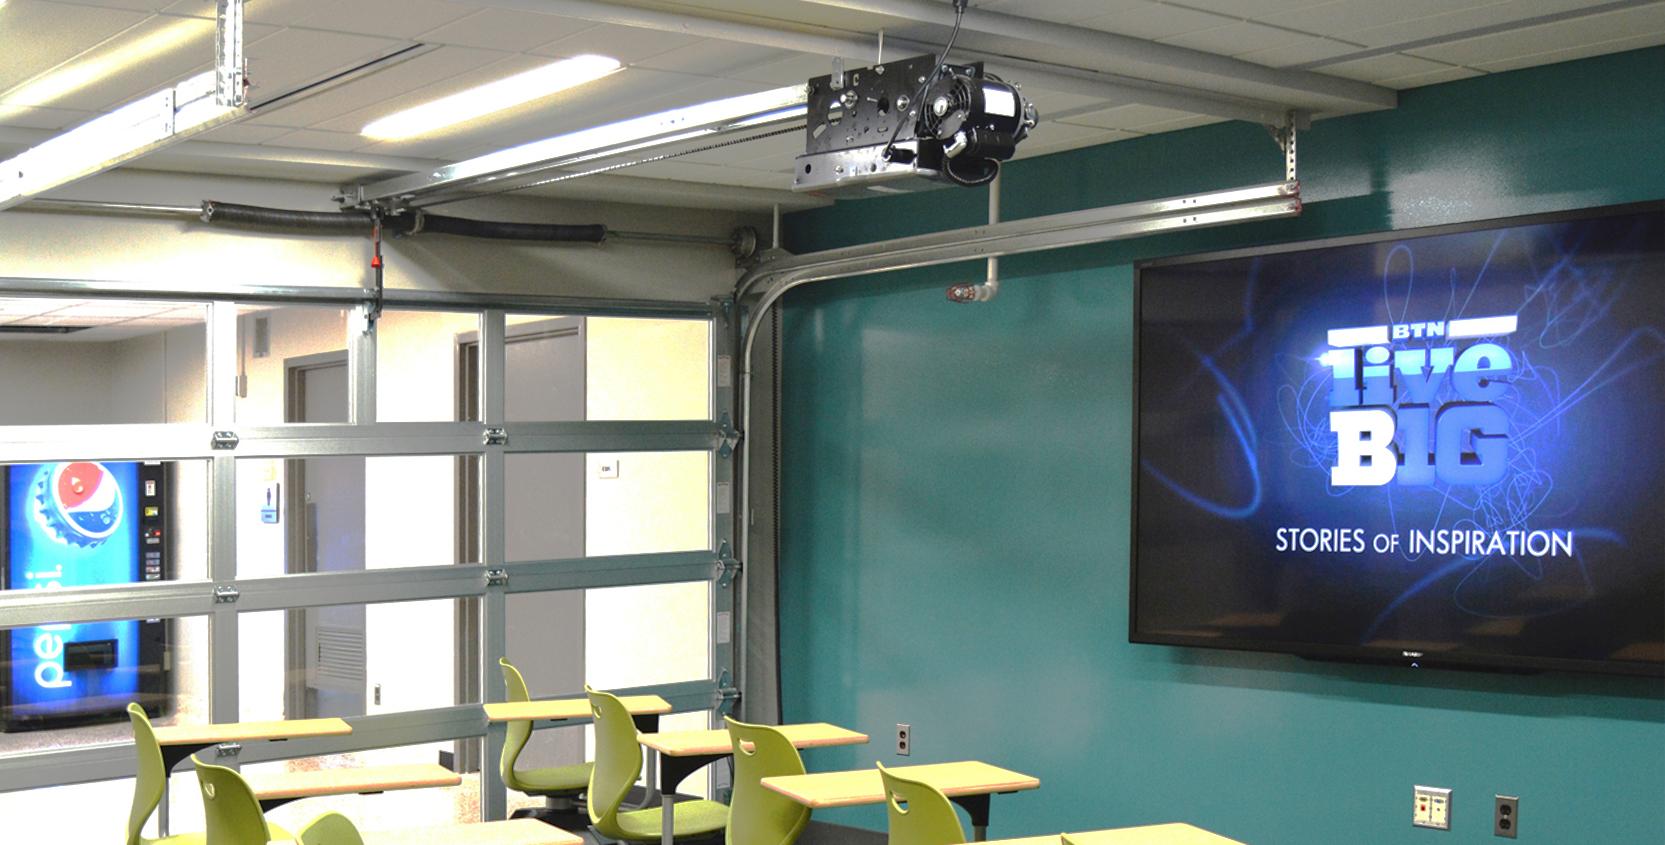 Michigan-State-University-Wilson-Hall-Creative-Commons-Classroom-2-1665x845